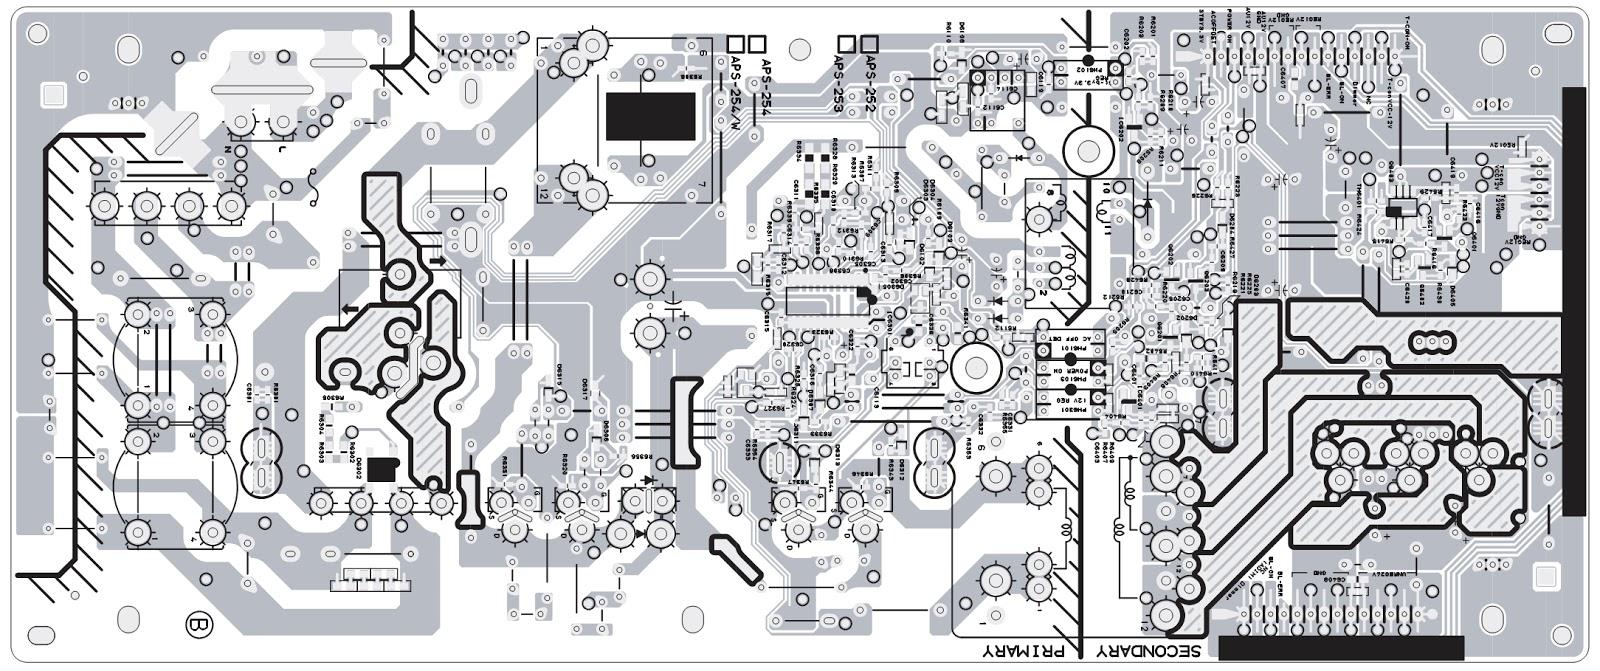 Sony klv 40bx400 firmware